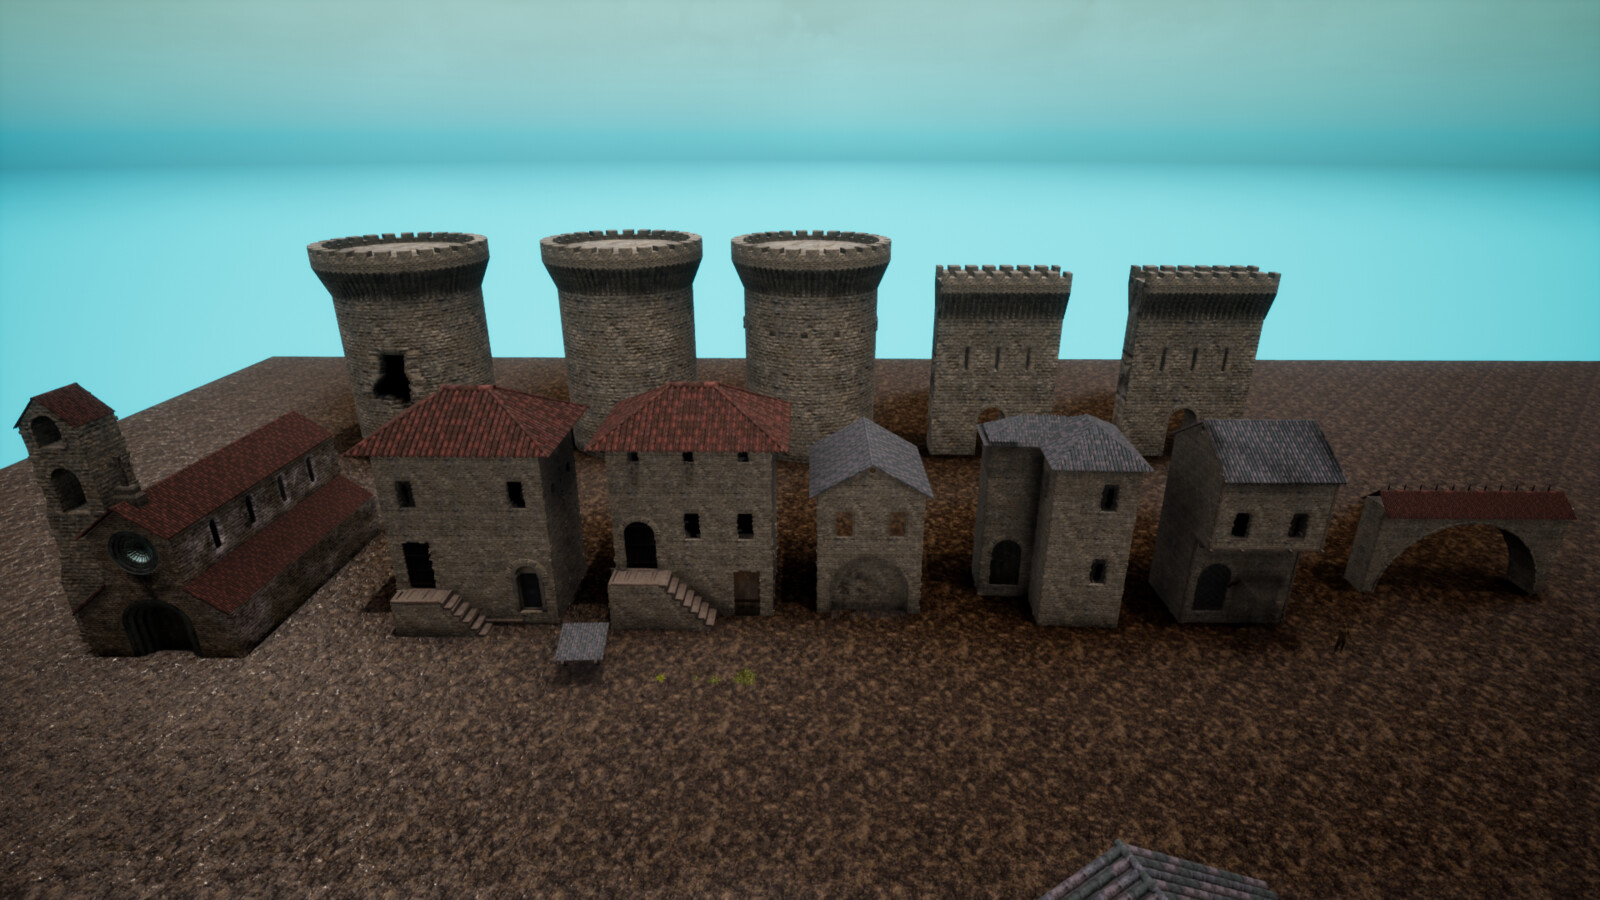 selection of modular buildings